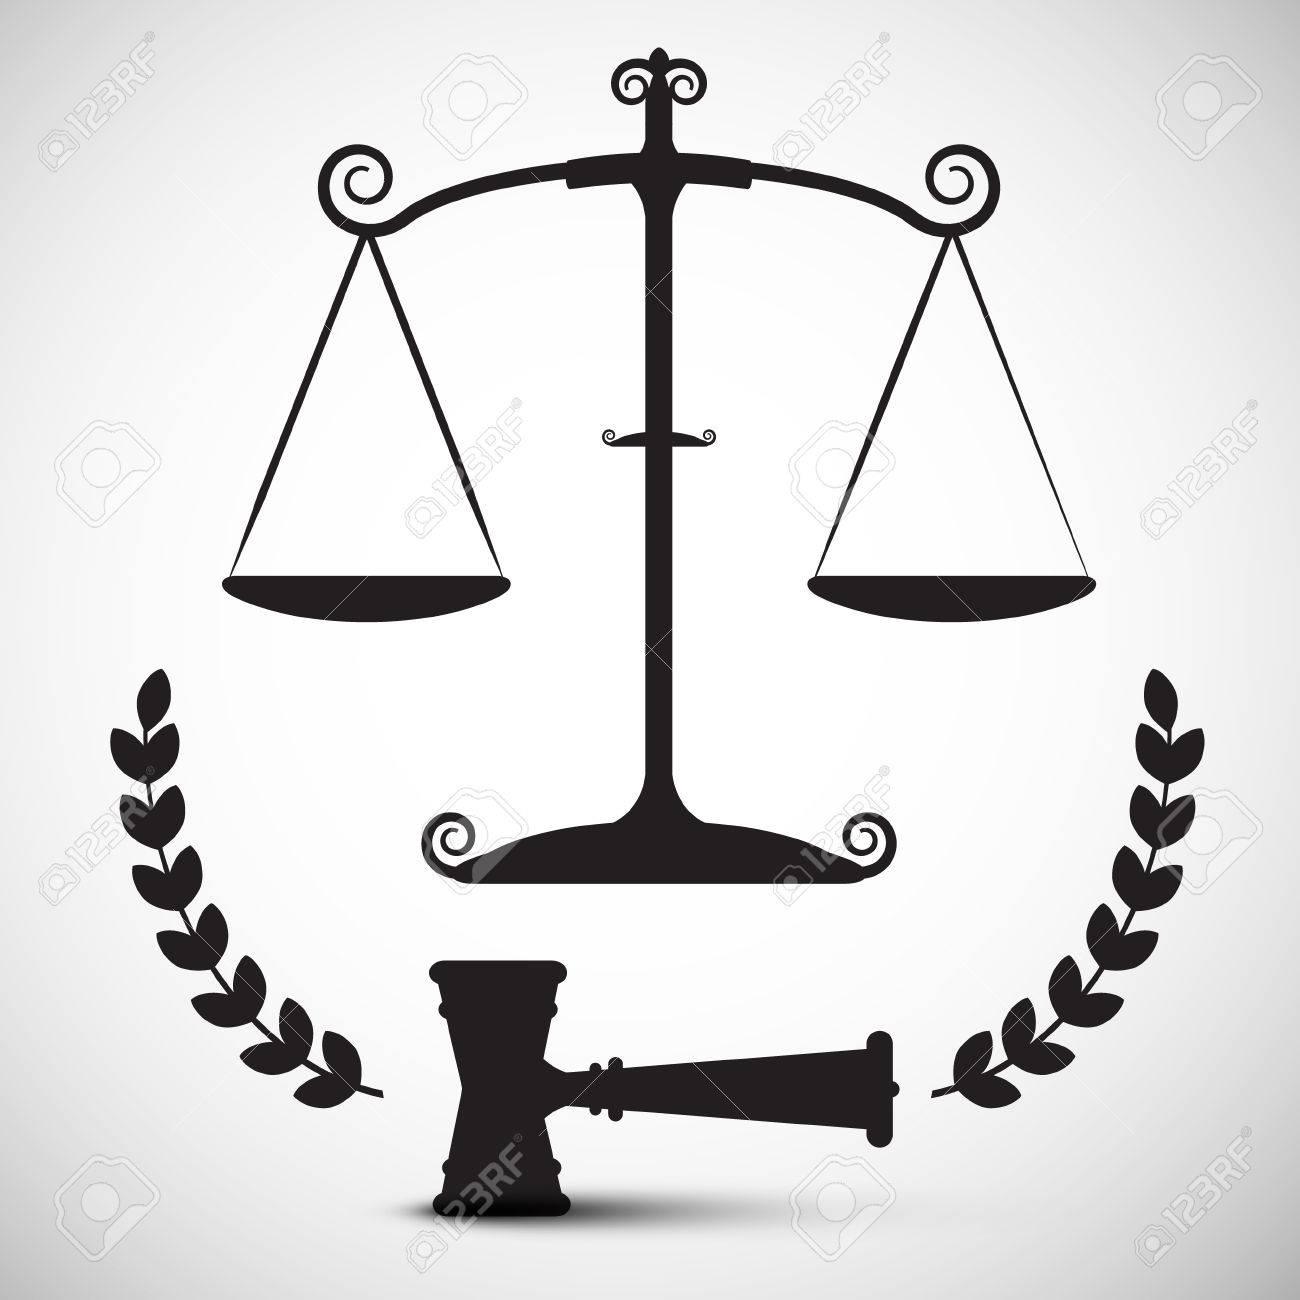 Justice scales symbol vector law hammer gavel pictogram royalty justice scales symbol vector law hammer gavel pictogram stock vector 61924893 buycottarizona Gallery